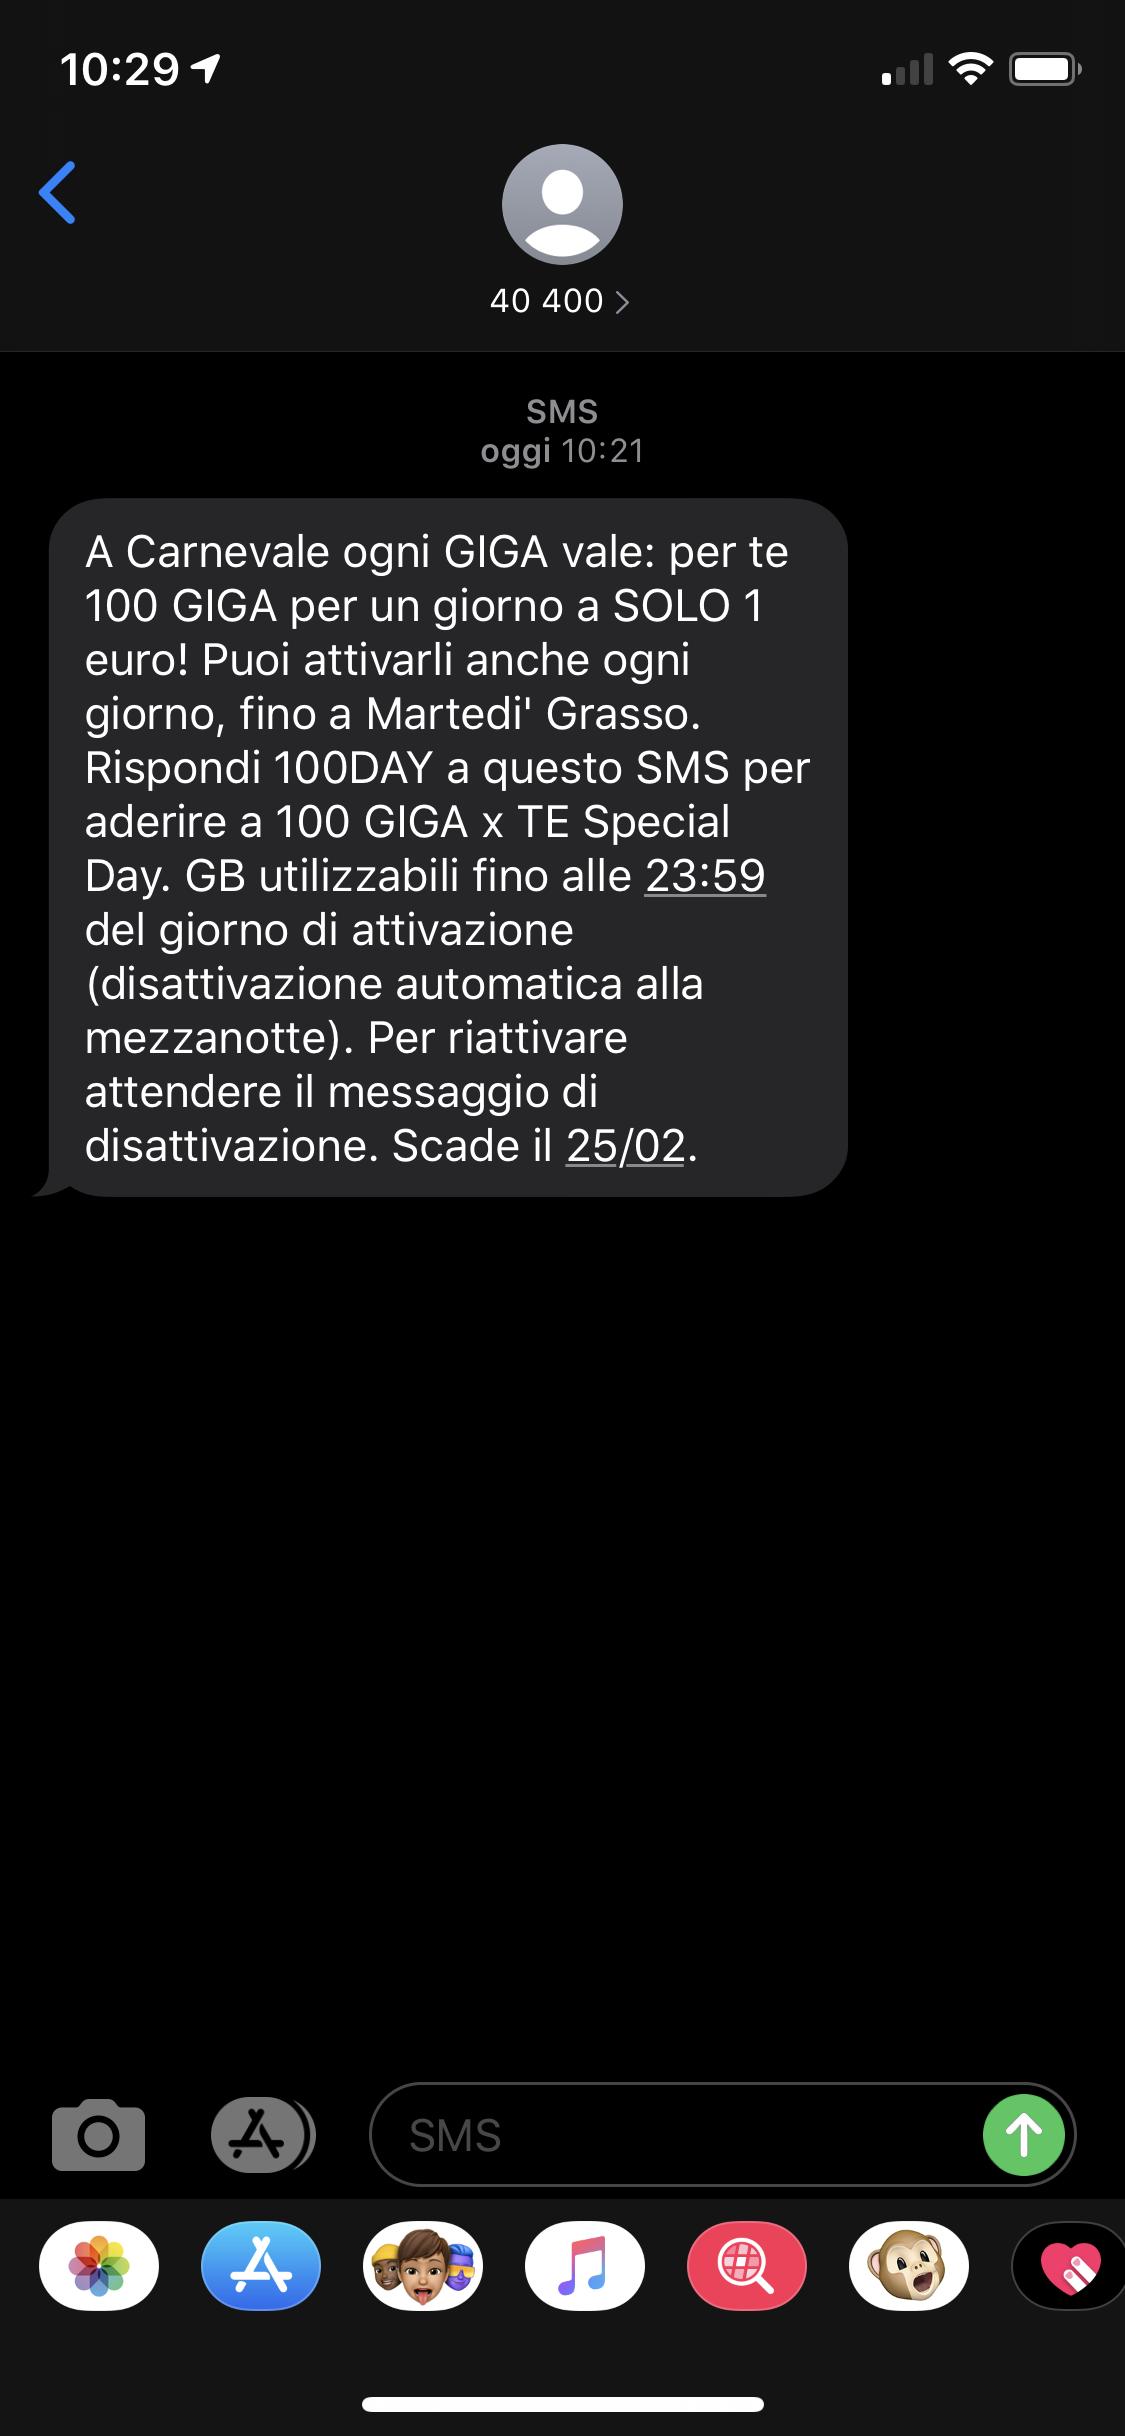 testo SMS offerta Wind 100 GIGA per Te